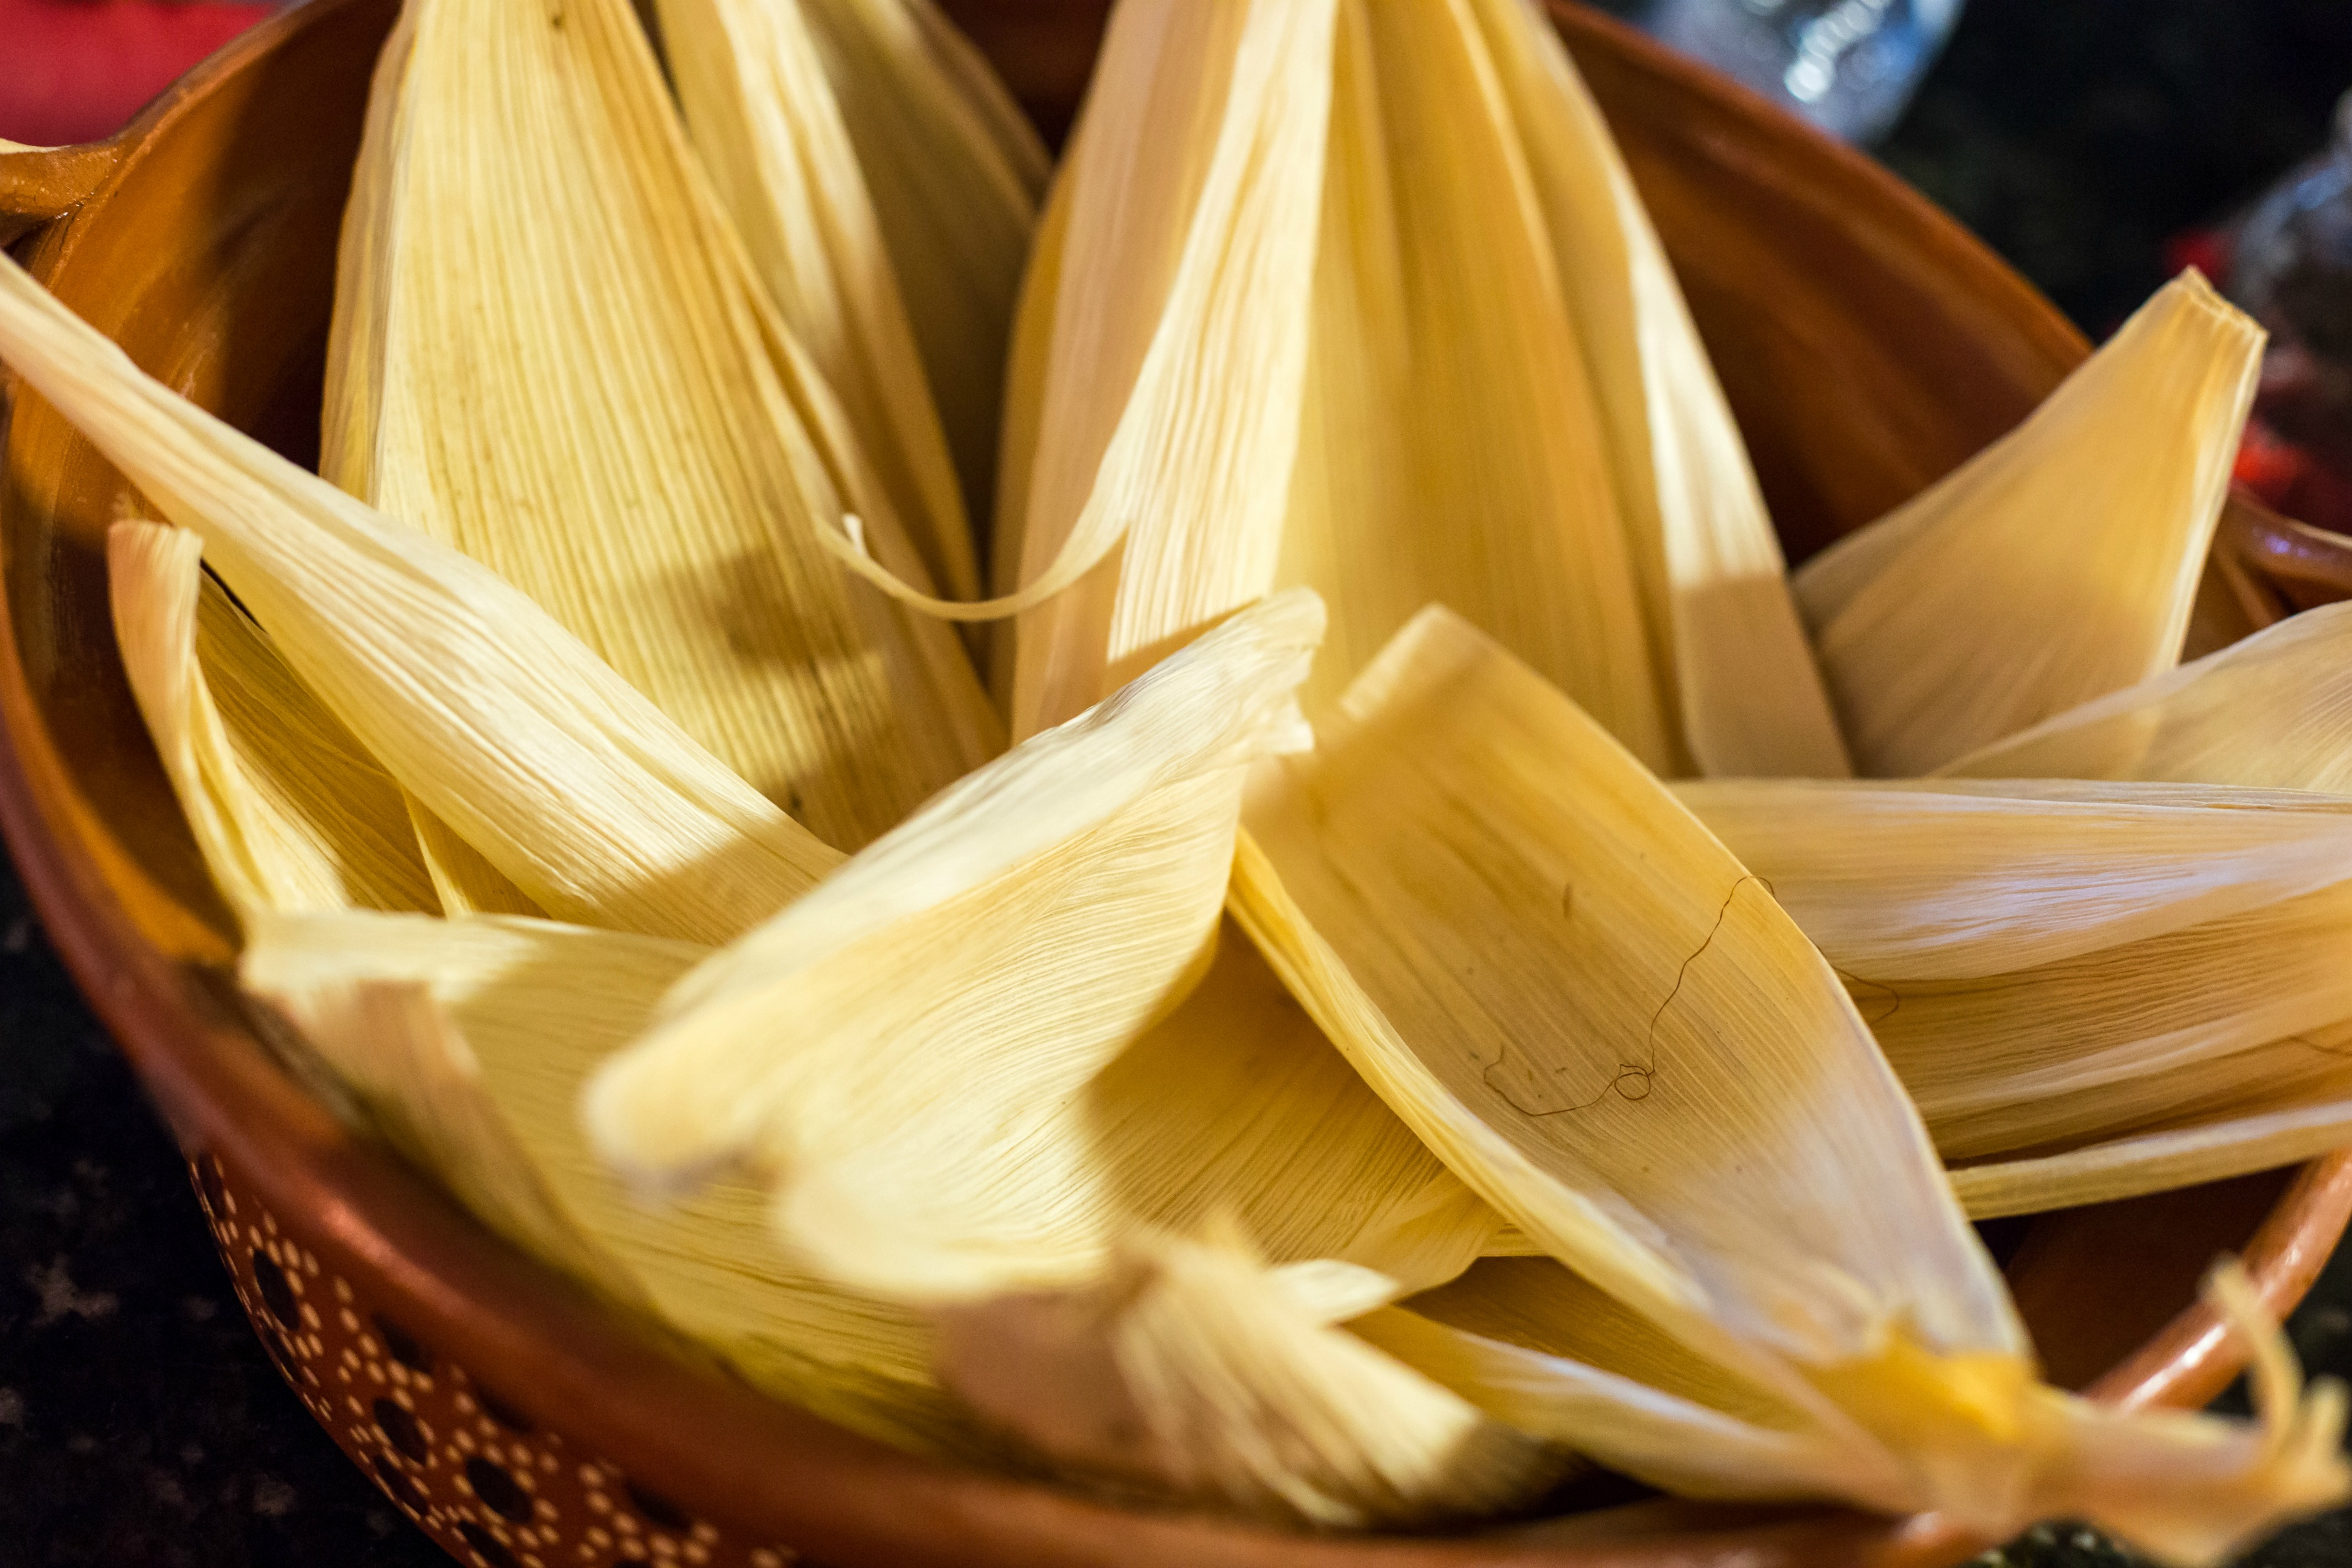 how-to-prepare-corn-husks-for-tamales-vianneyrodriguez-sweetlifebake